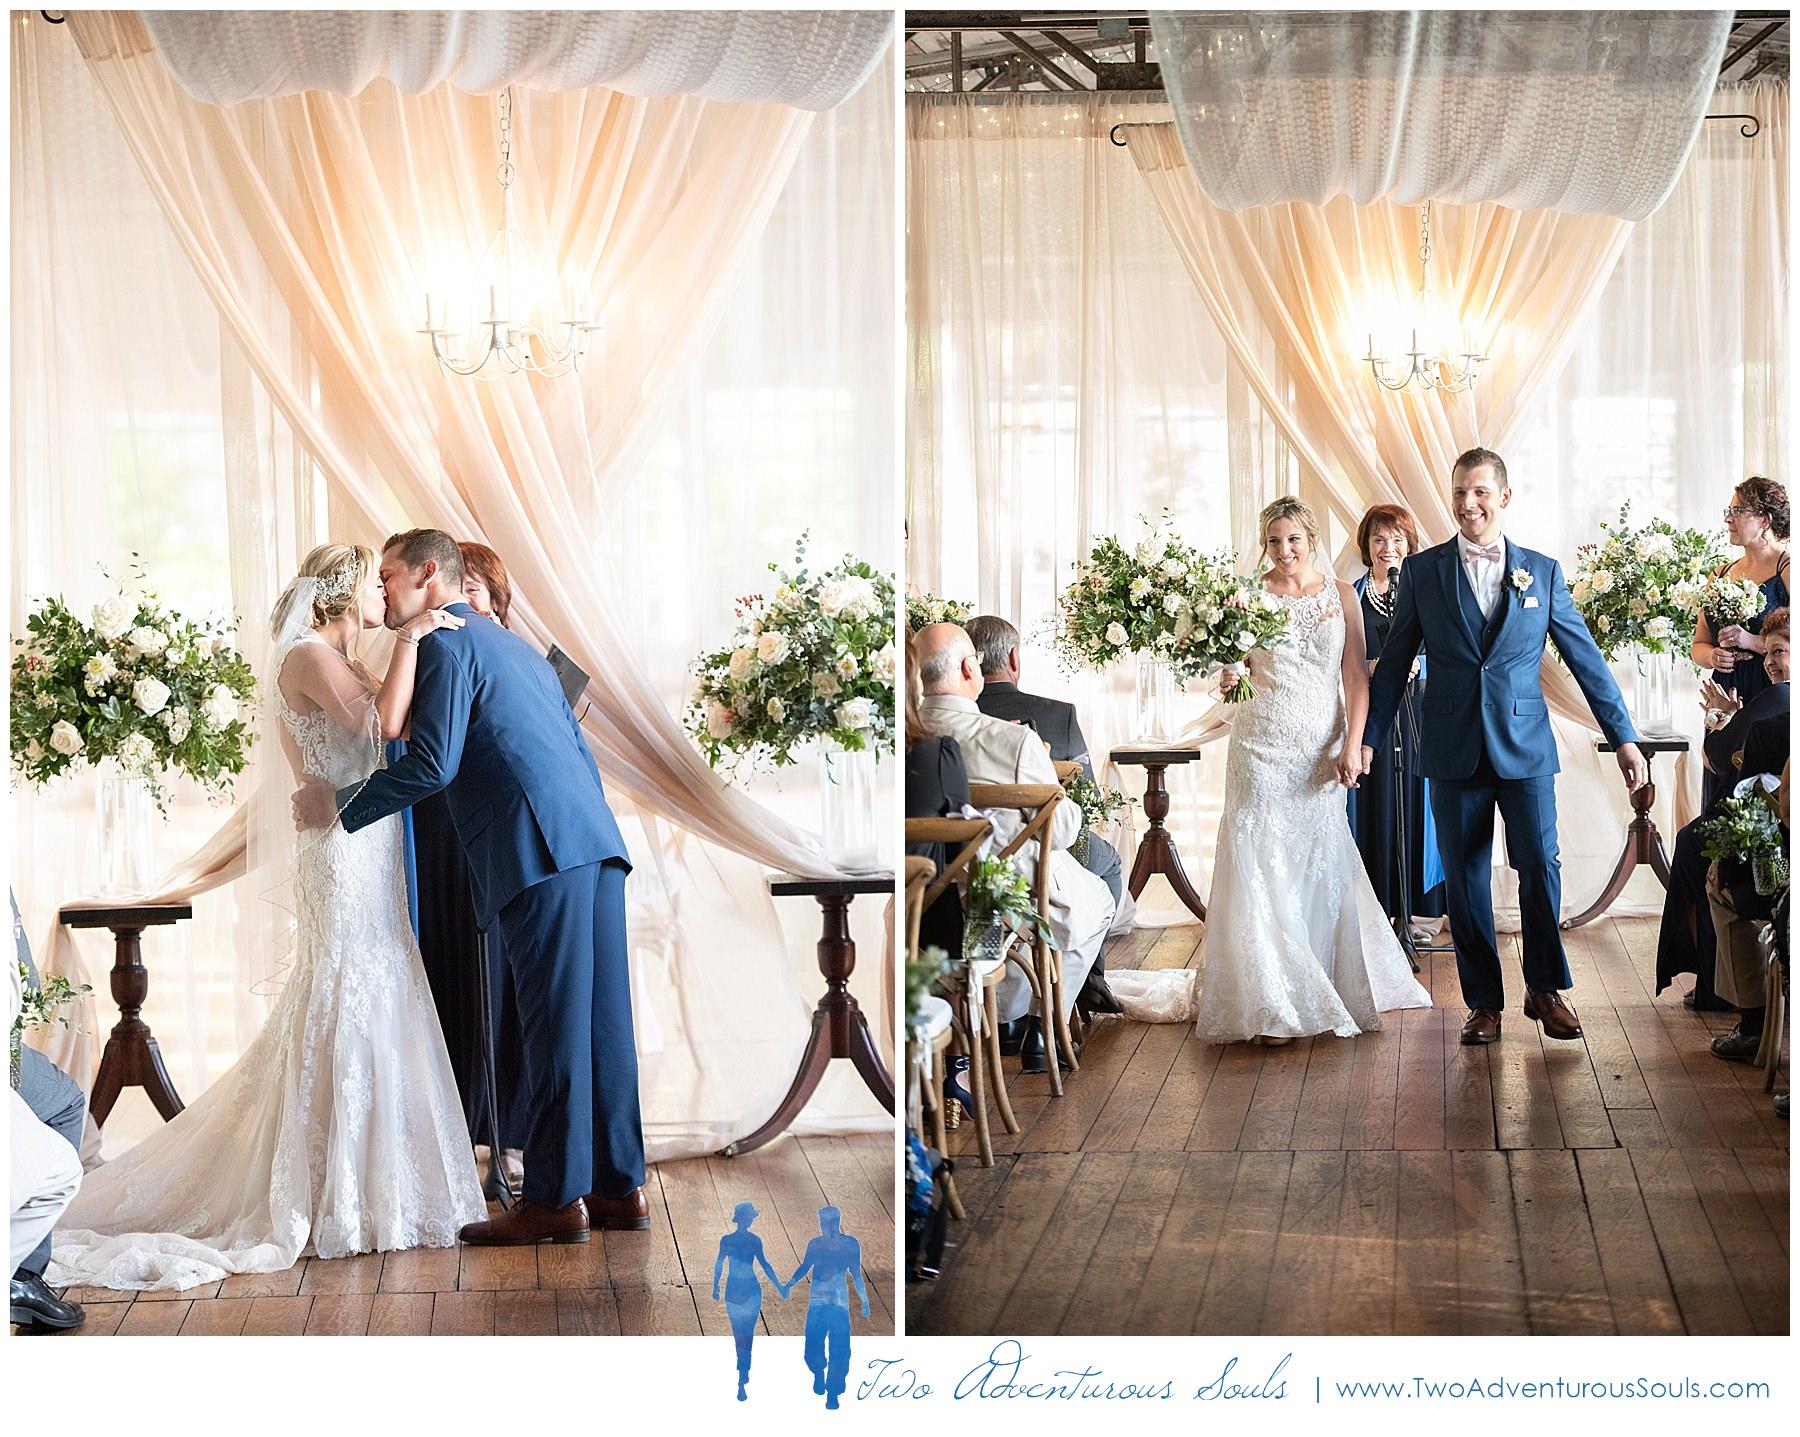 Connecticut Wedding Photographers, Lace Factory Wedding Photographers, Two Adventurous Souls - 083119_0038.jpg